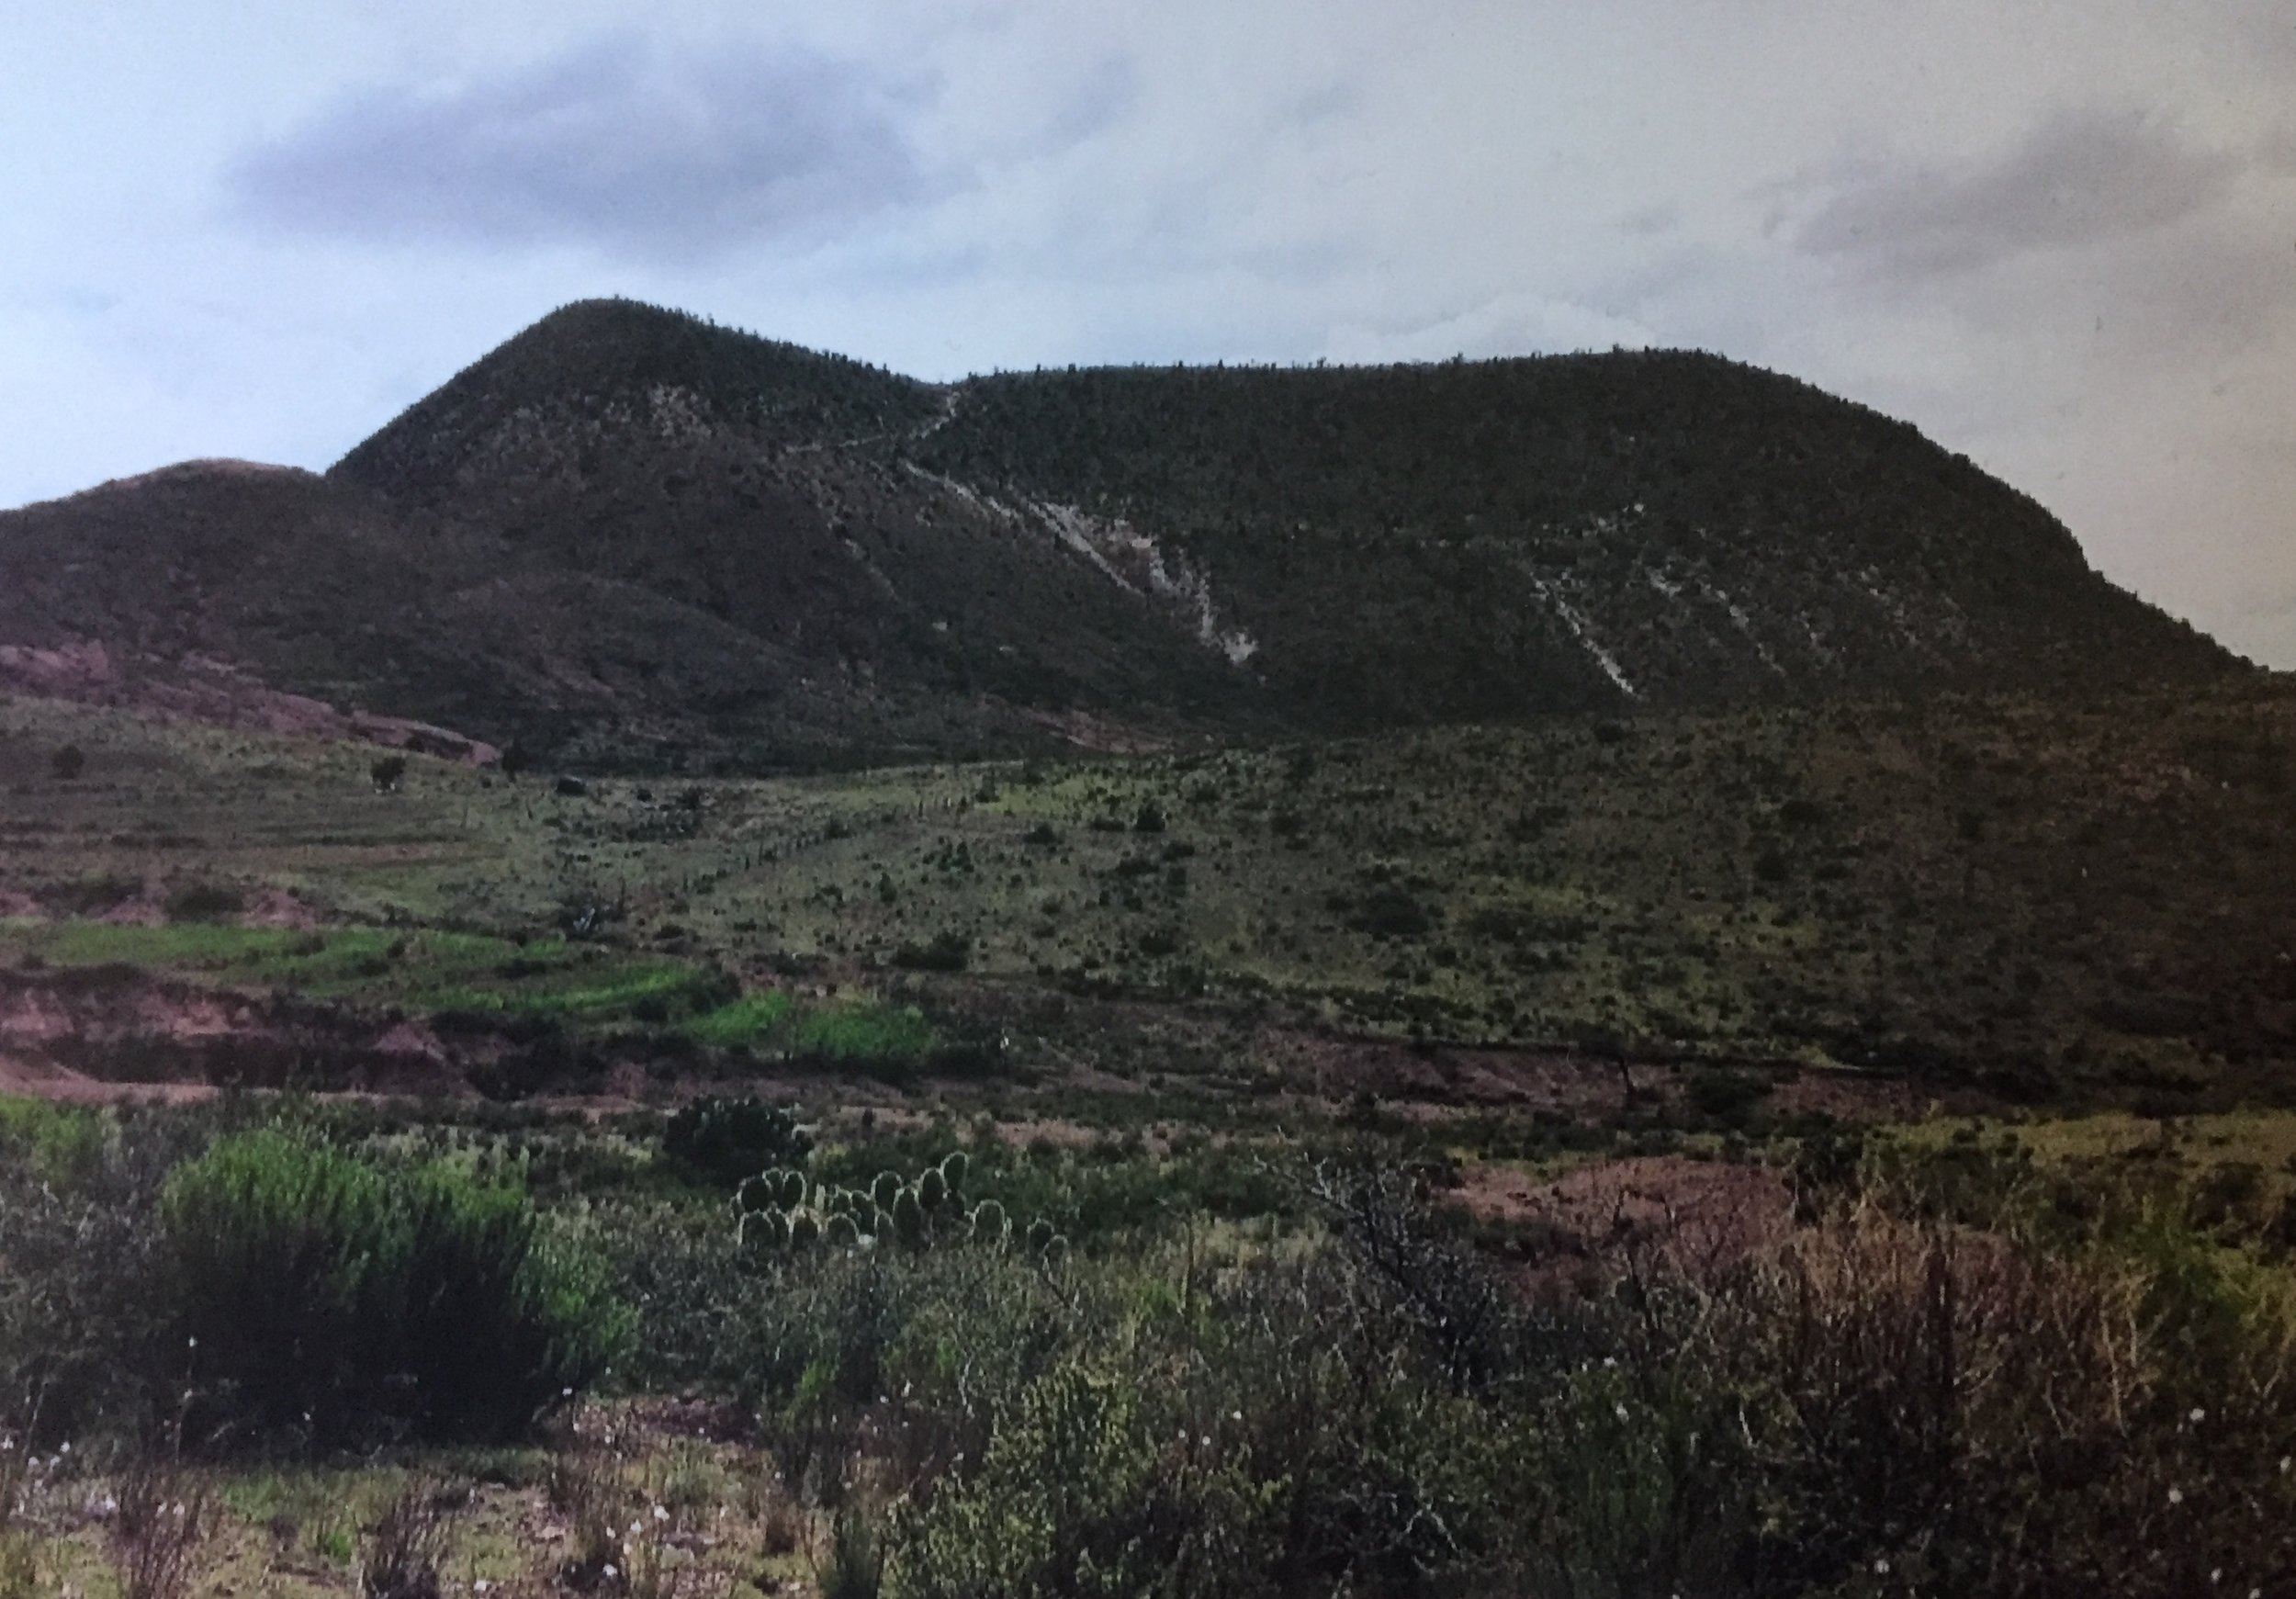 Cerro Quemado. Photo credit: Genie Hobbs